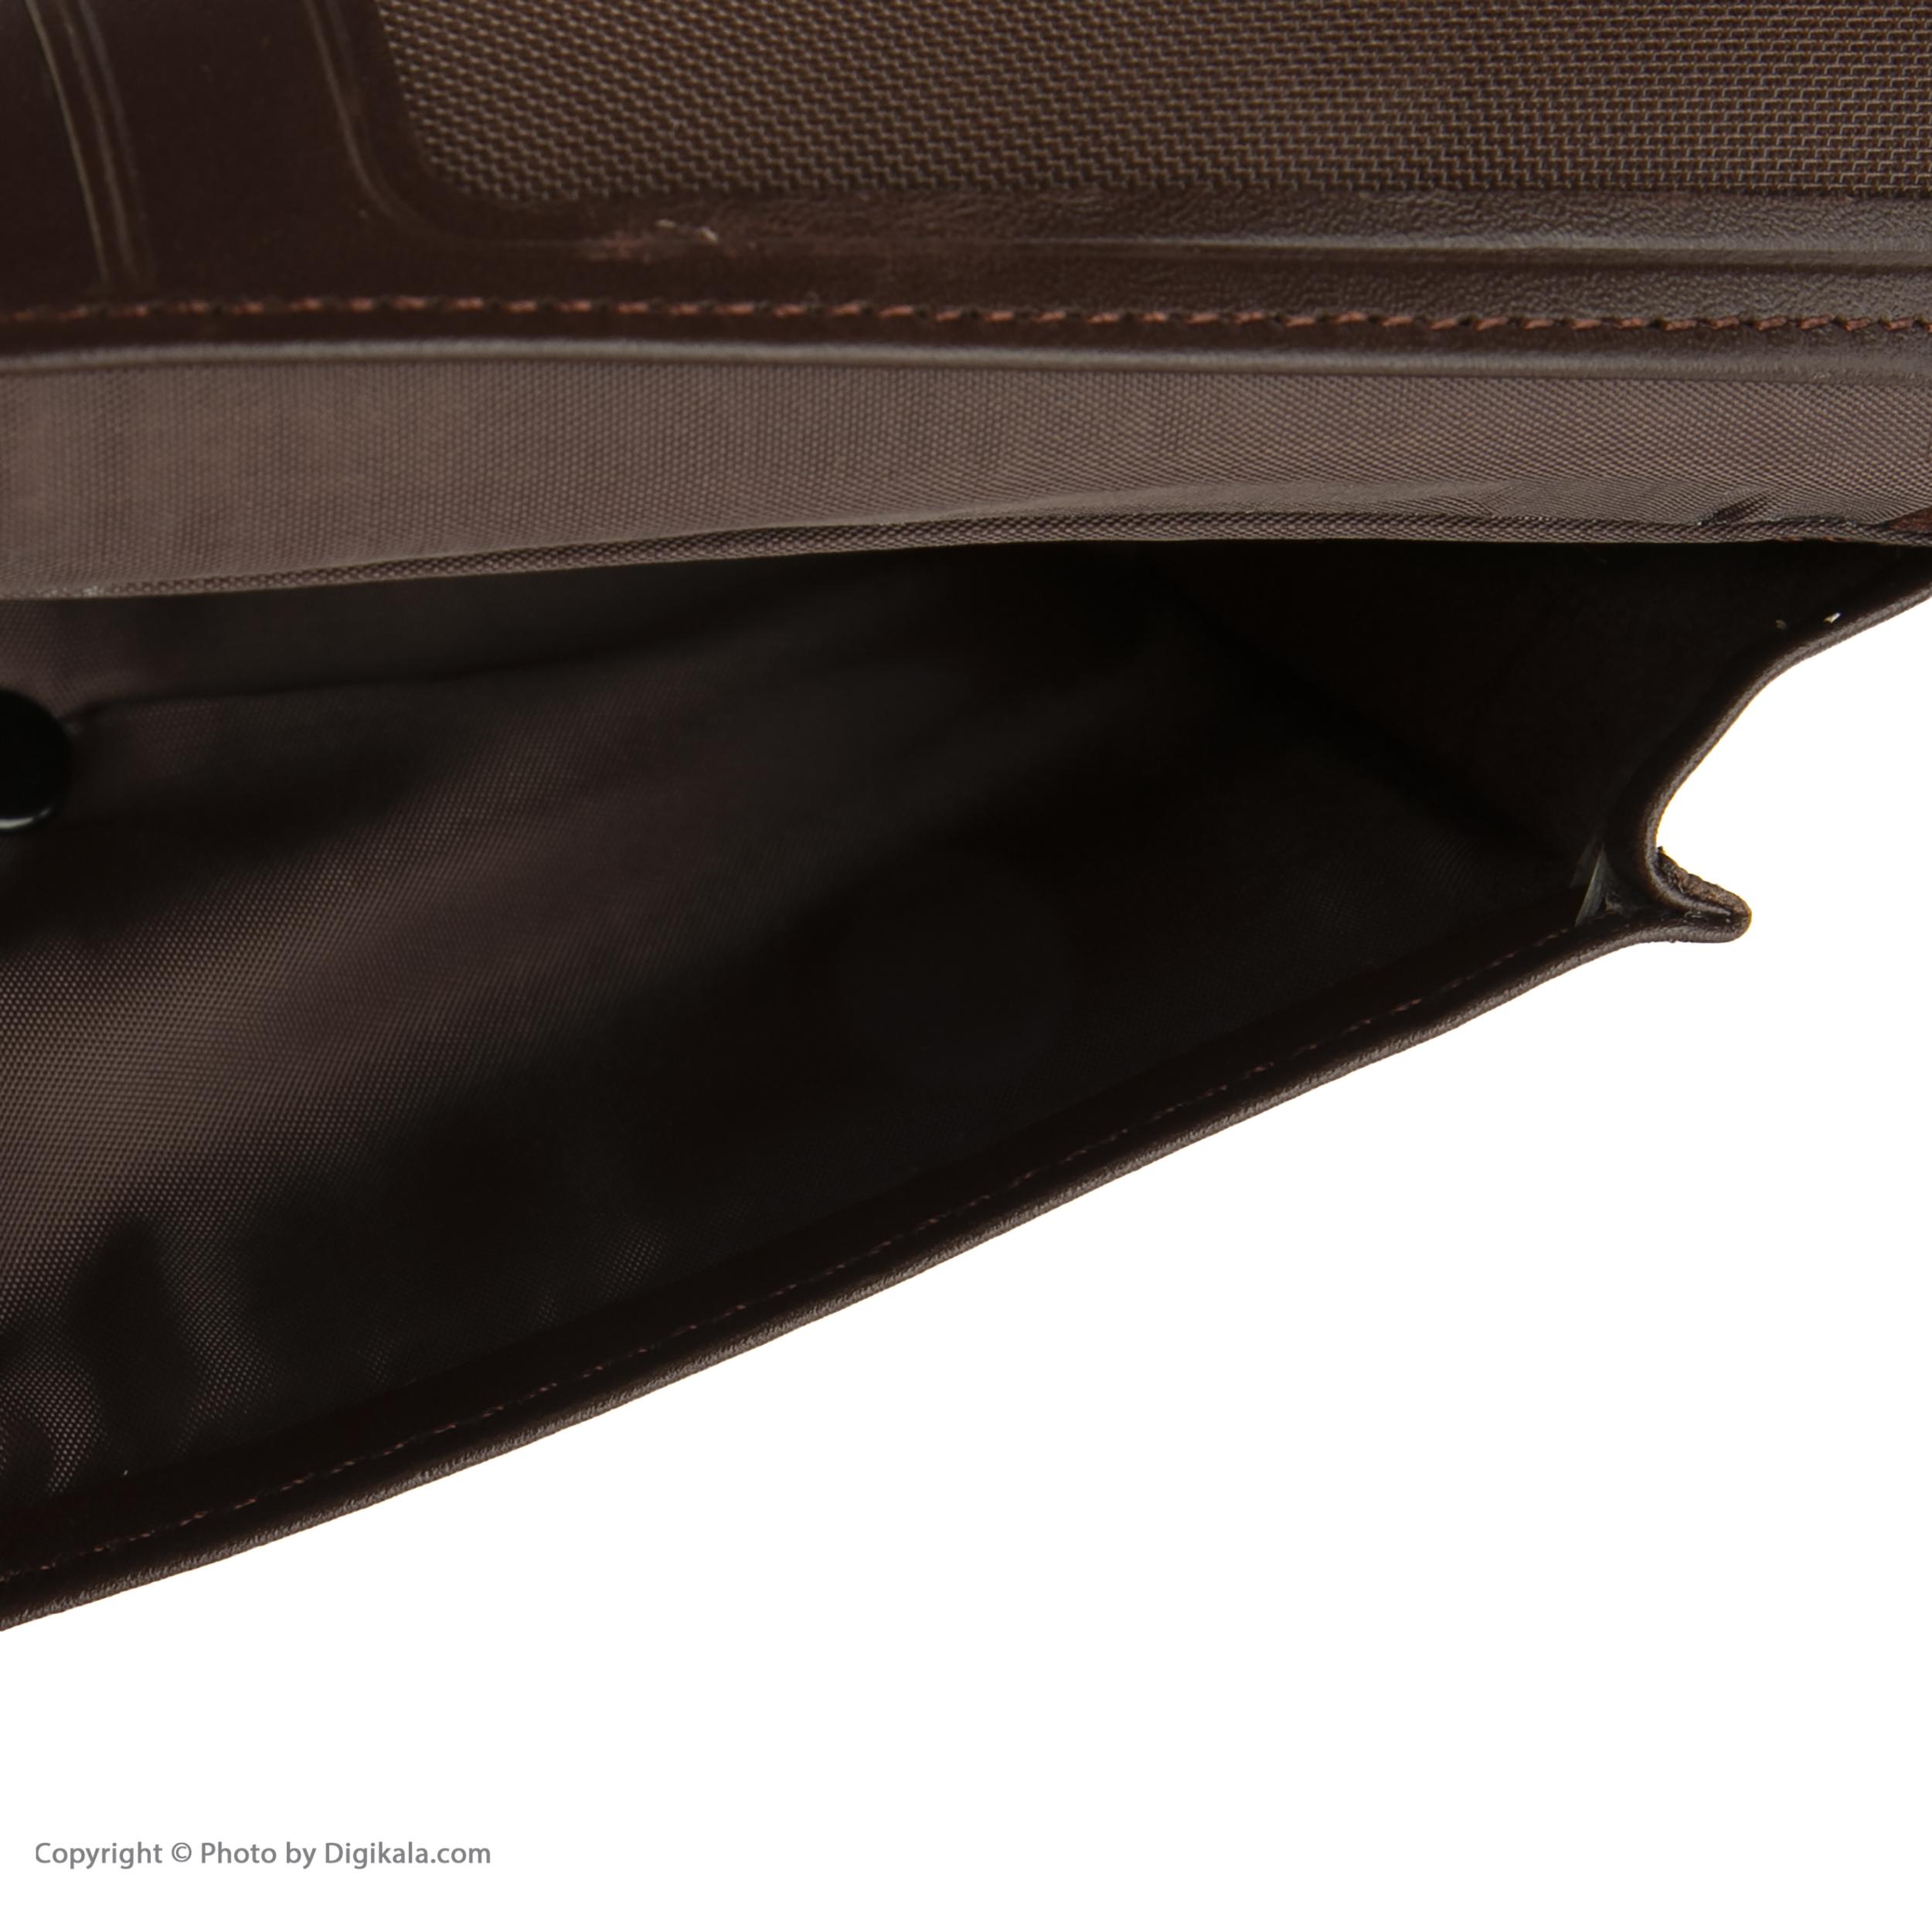 کیف پول چرمیران مدل 6059701 -  - 8